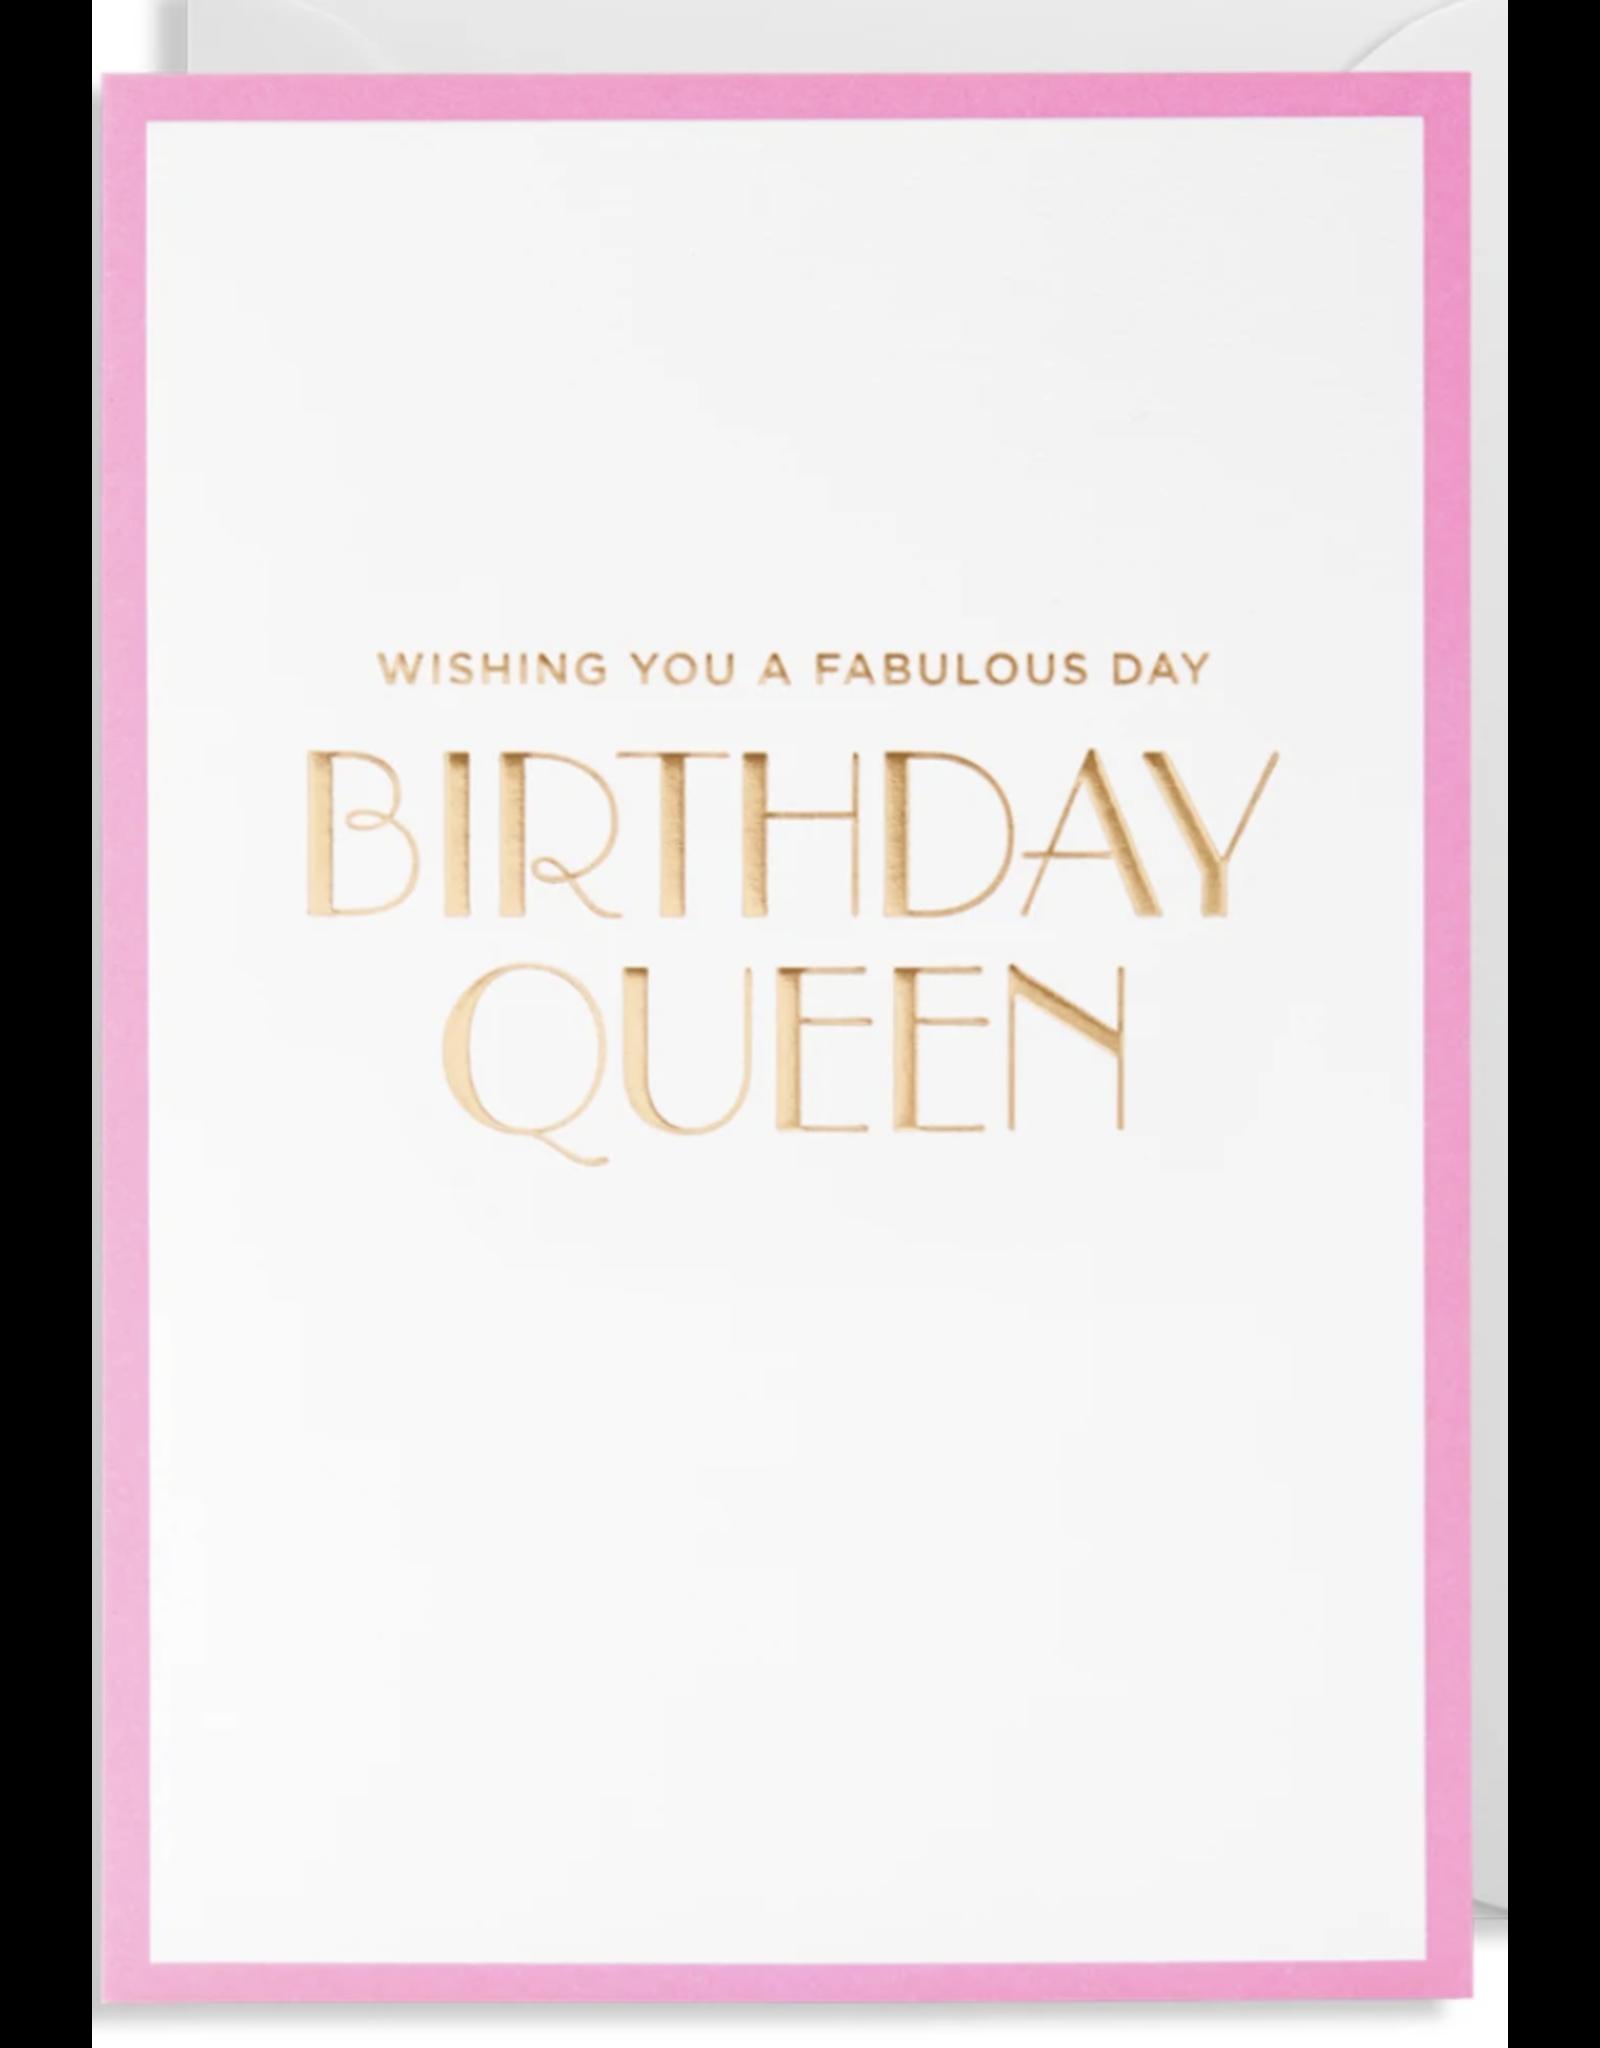 Birthday - Birthday Queen